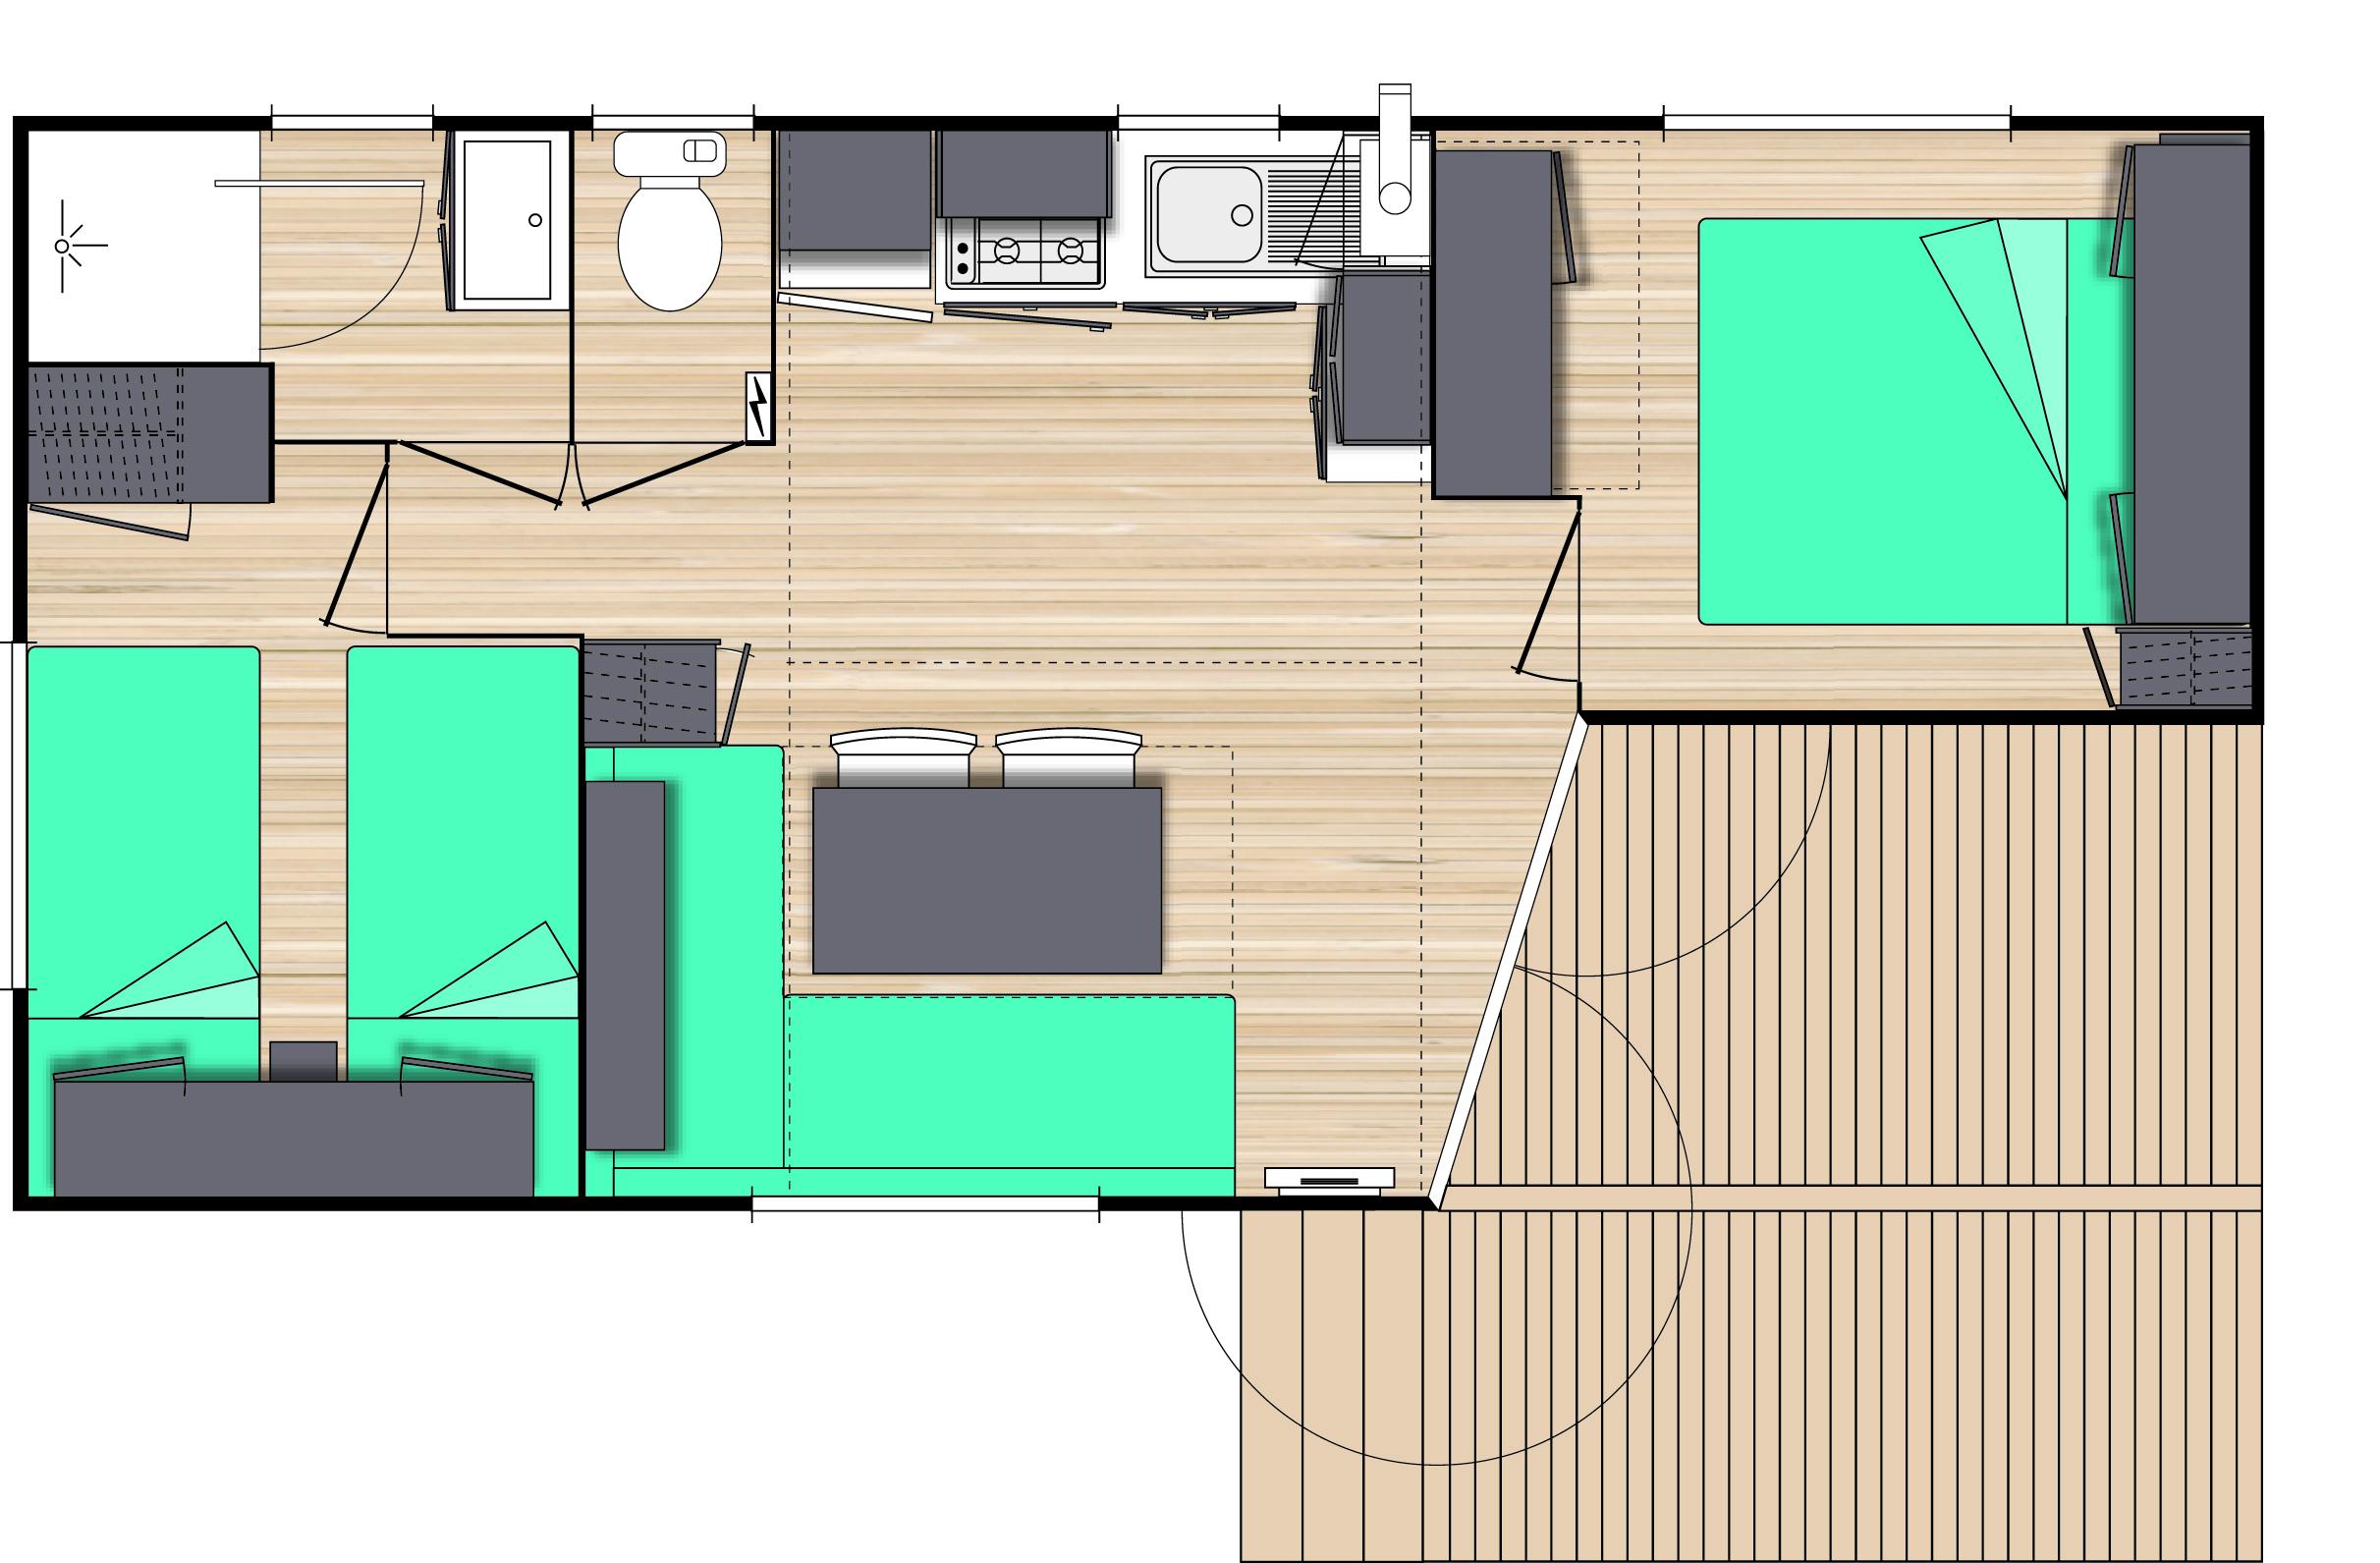 Plan du mobil home 2 chambres